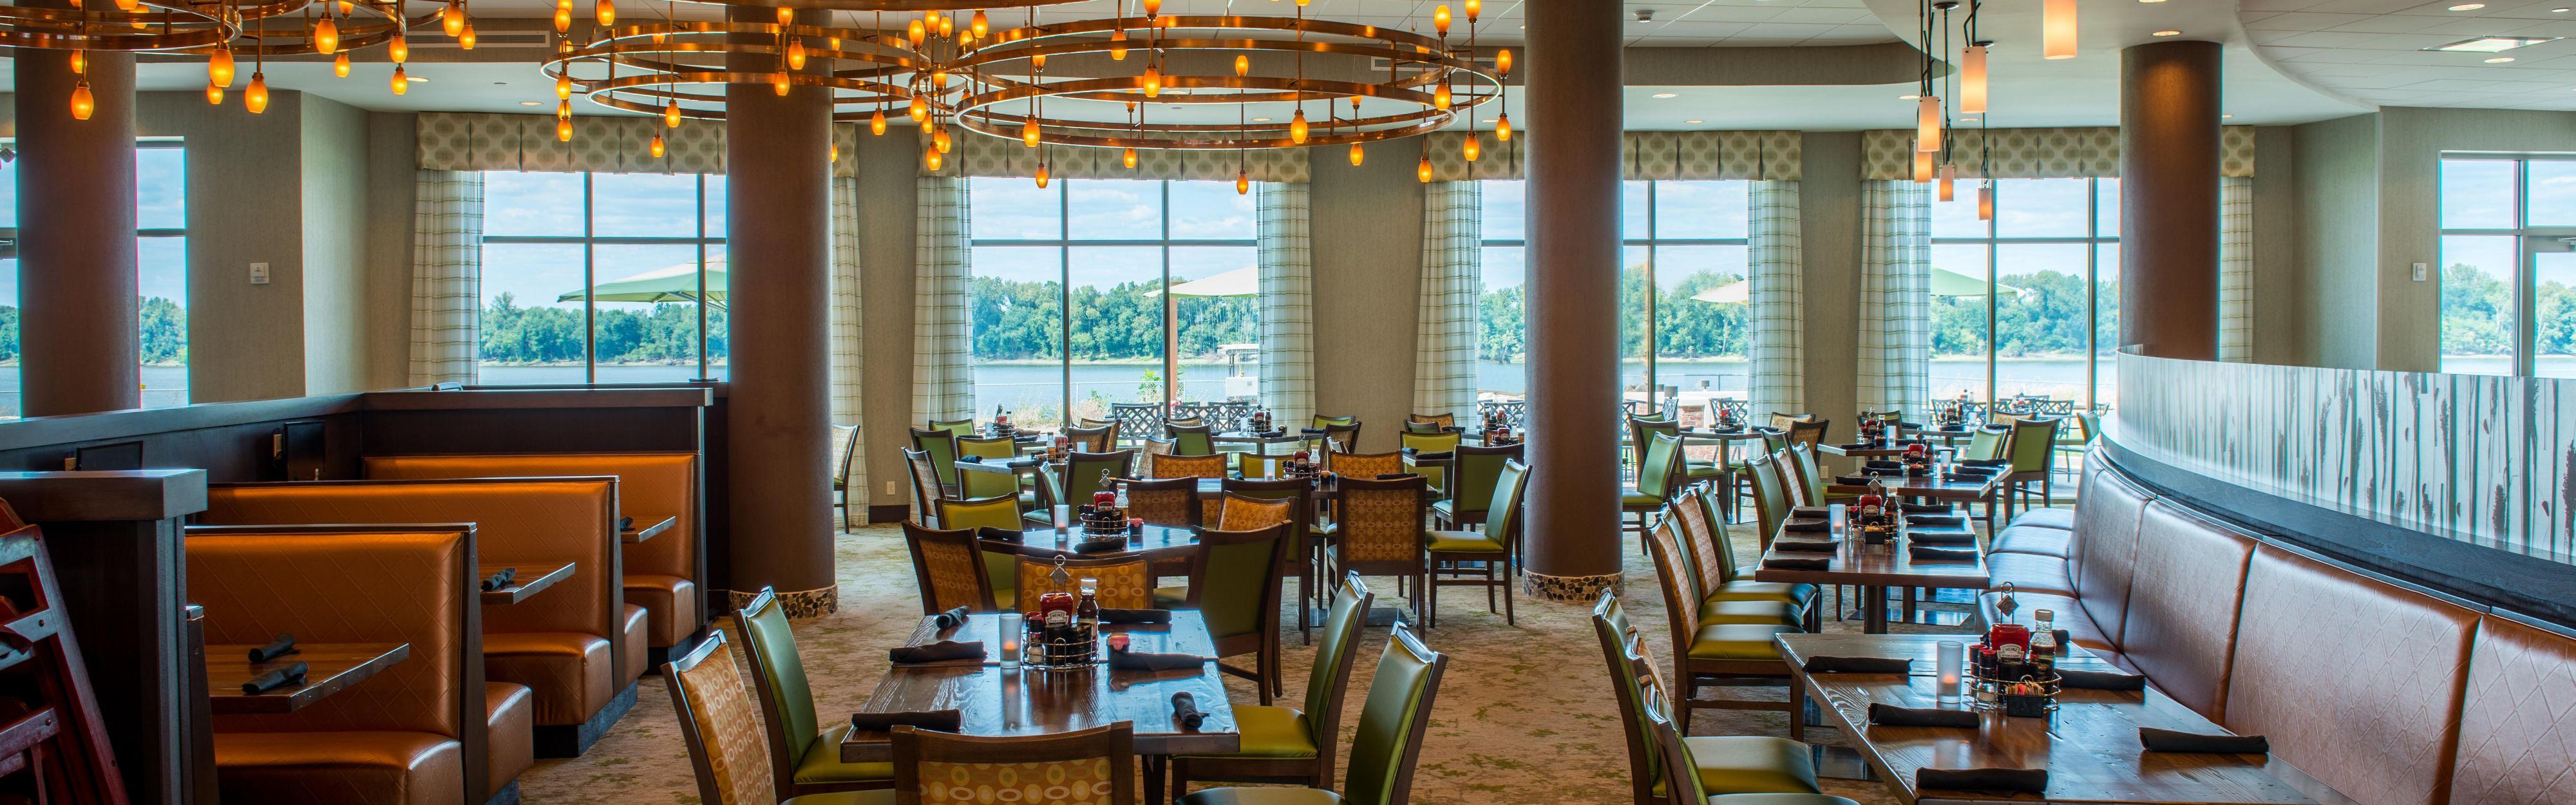 Holiday Inn Owensboro Riverfront image 3